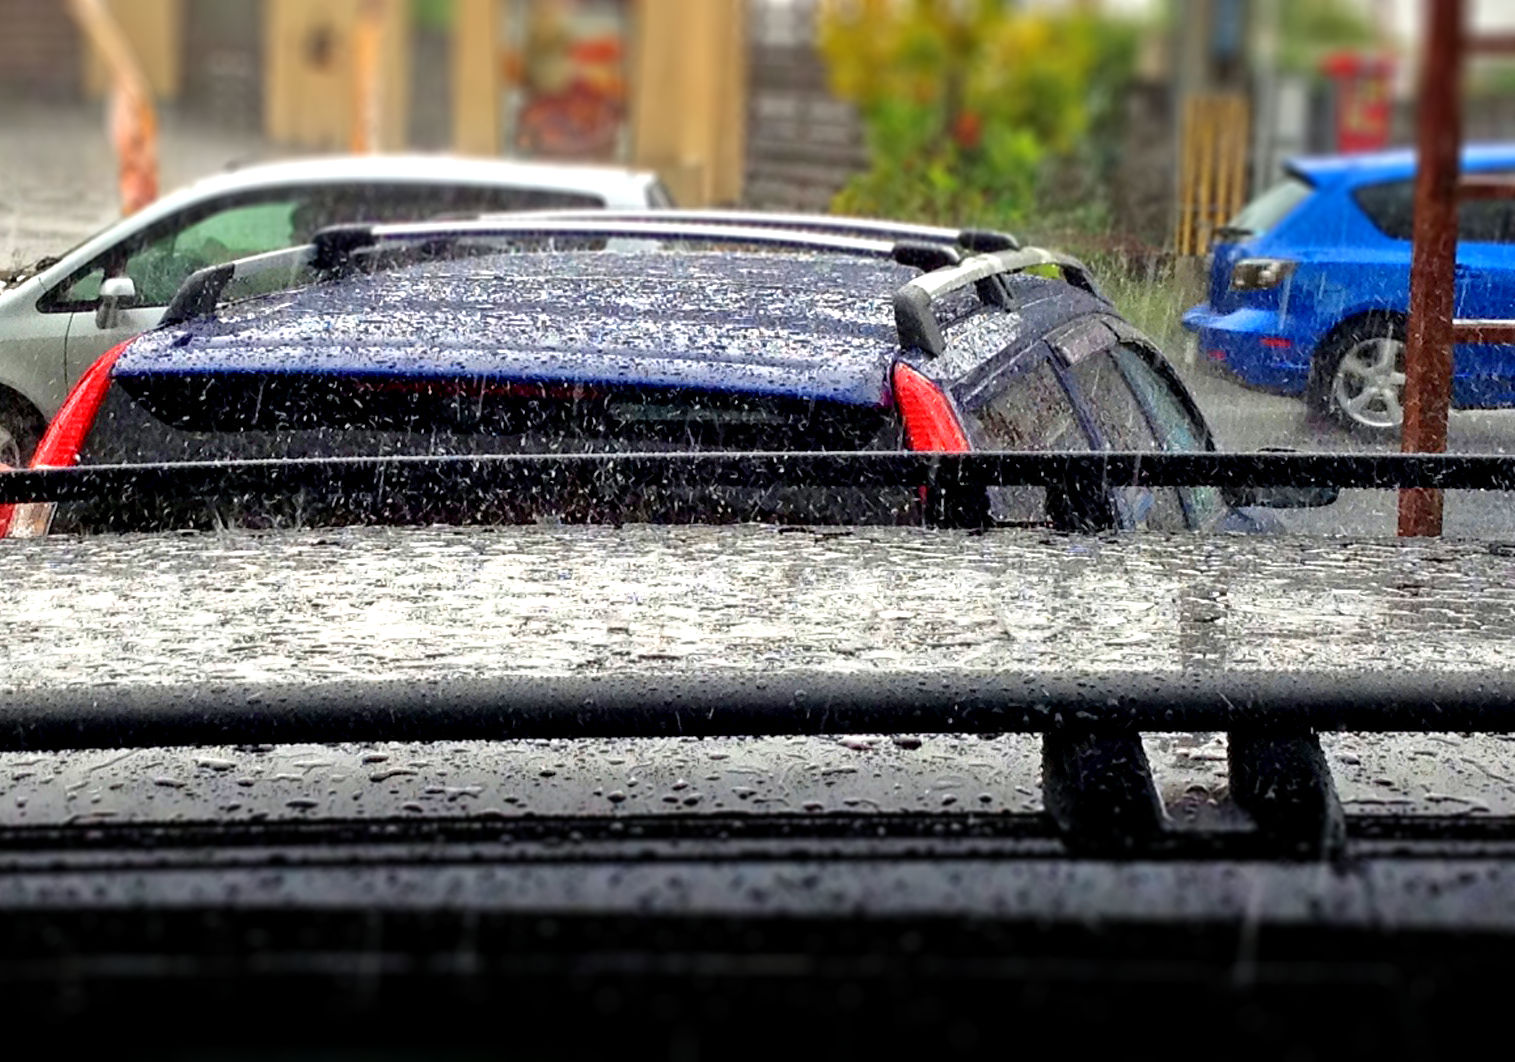 8月23日 金曜日 晴れ一時雨_a0132812_16131327.jpg